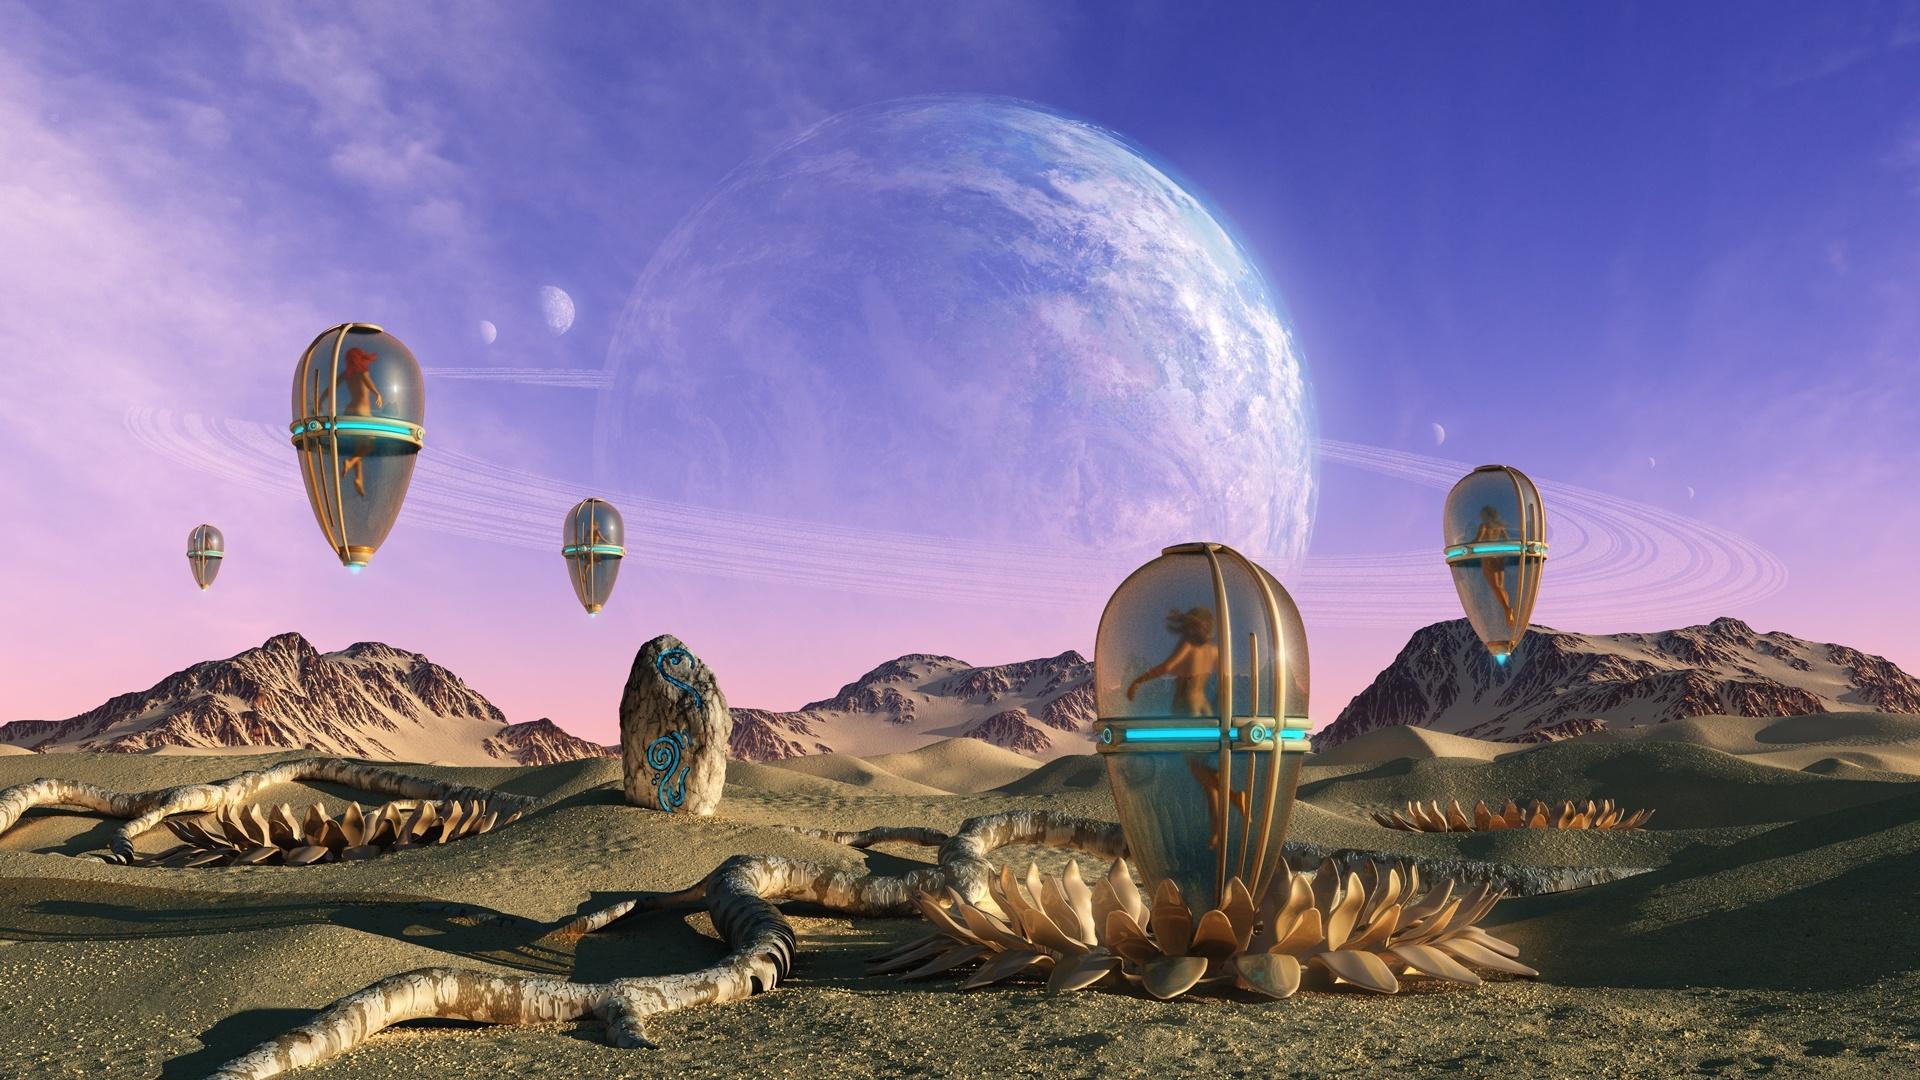 Alien Planet Art Desktop Wallpaper